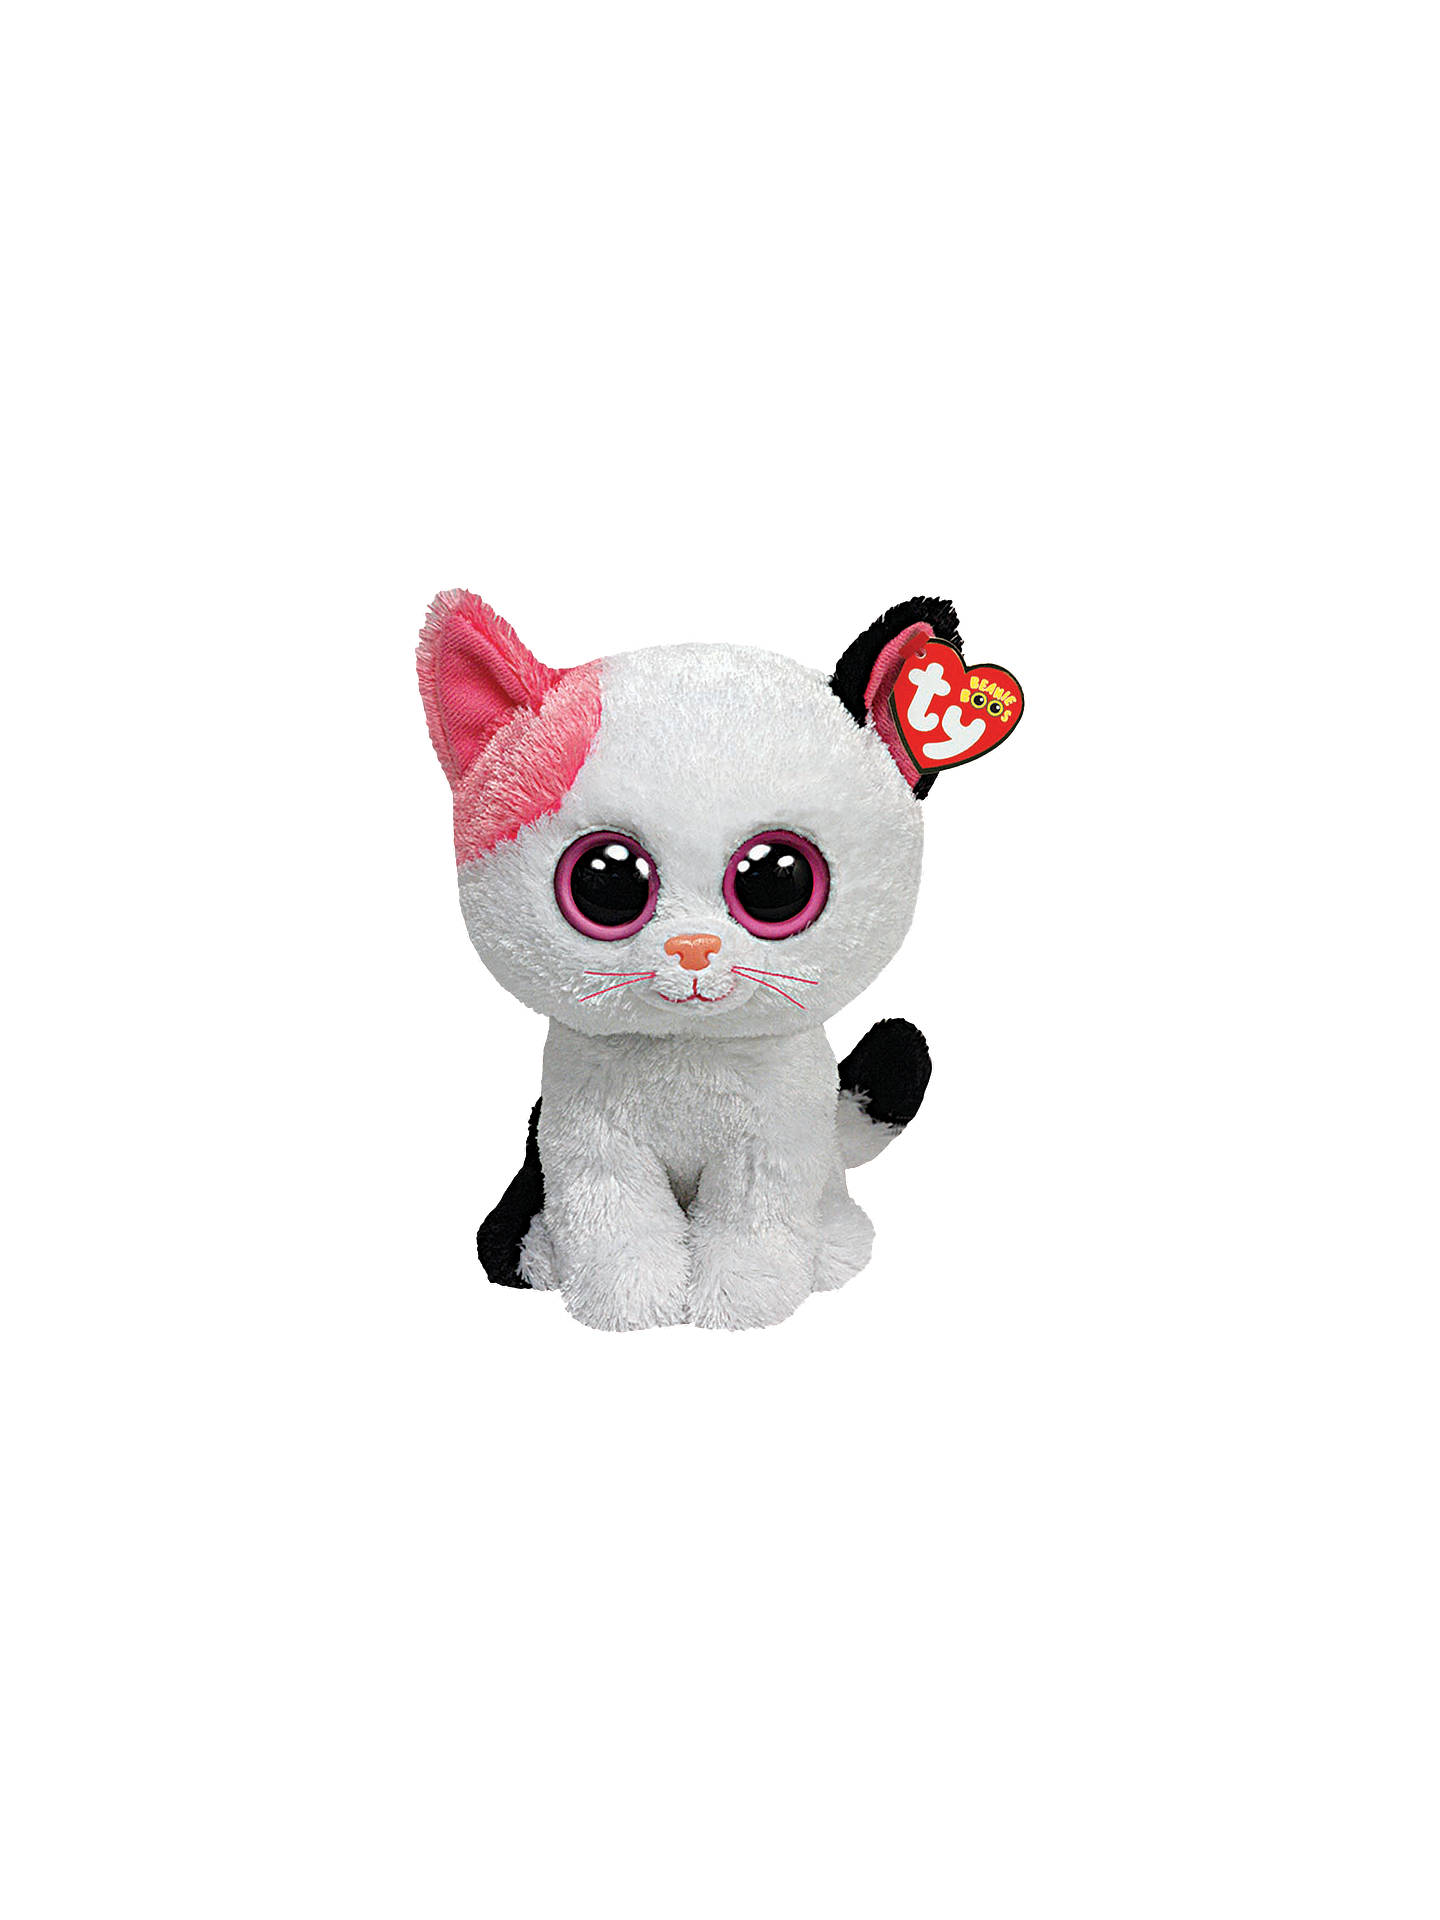 37ff0f30f2f1 Buy Ty Beanie Boo Muffin Cat Soft Toy